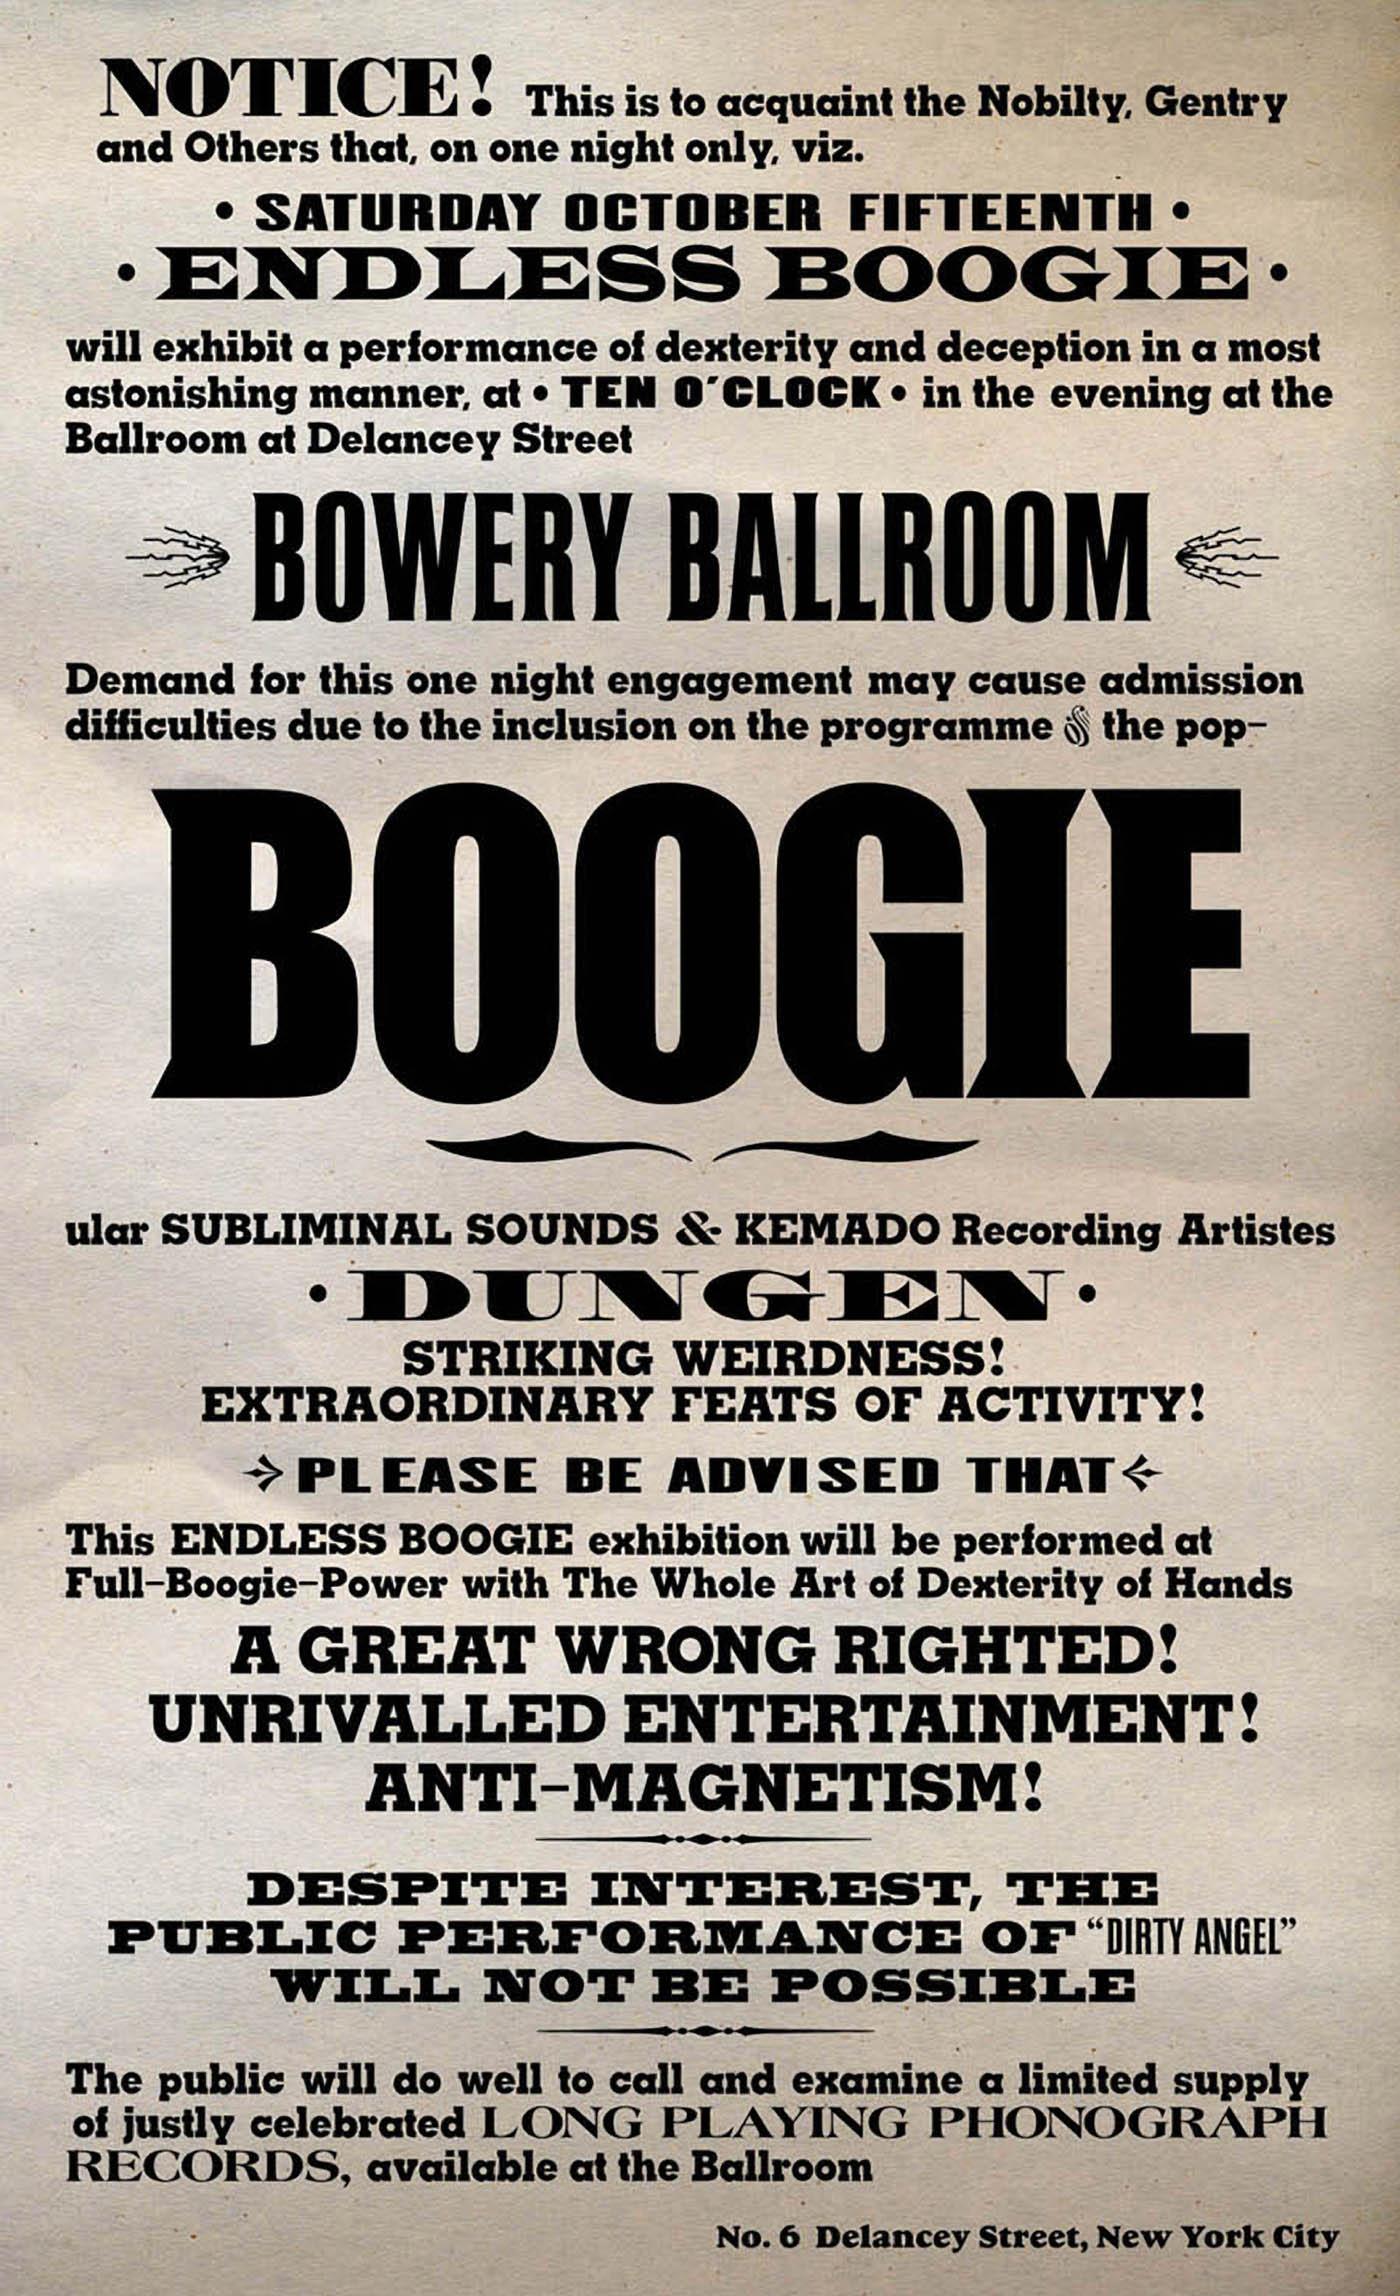 Endless Boogie - Siberia Live